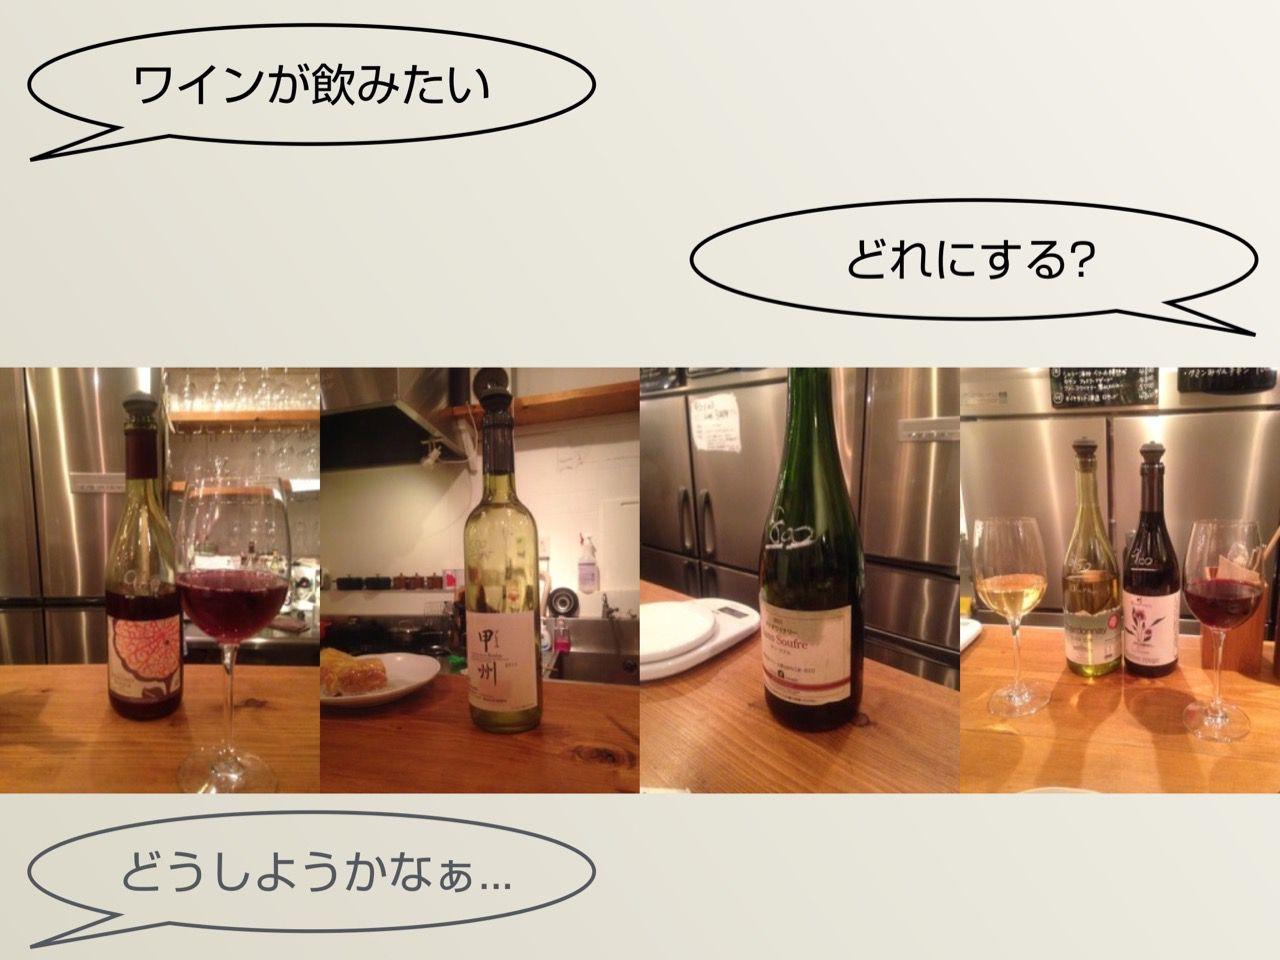 images/AJACS64_03_nakazato_026.jpg